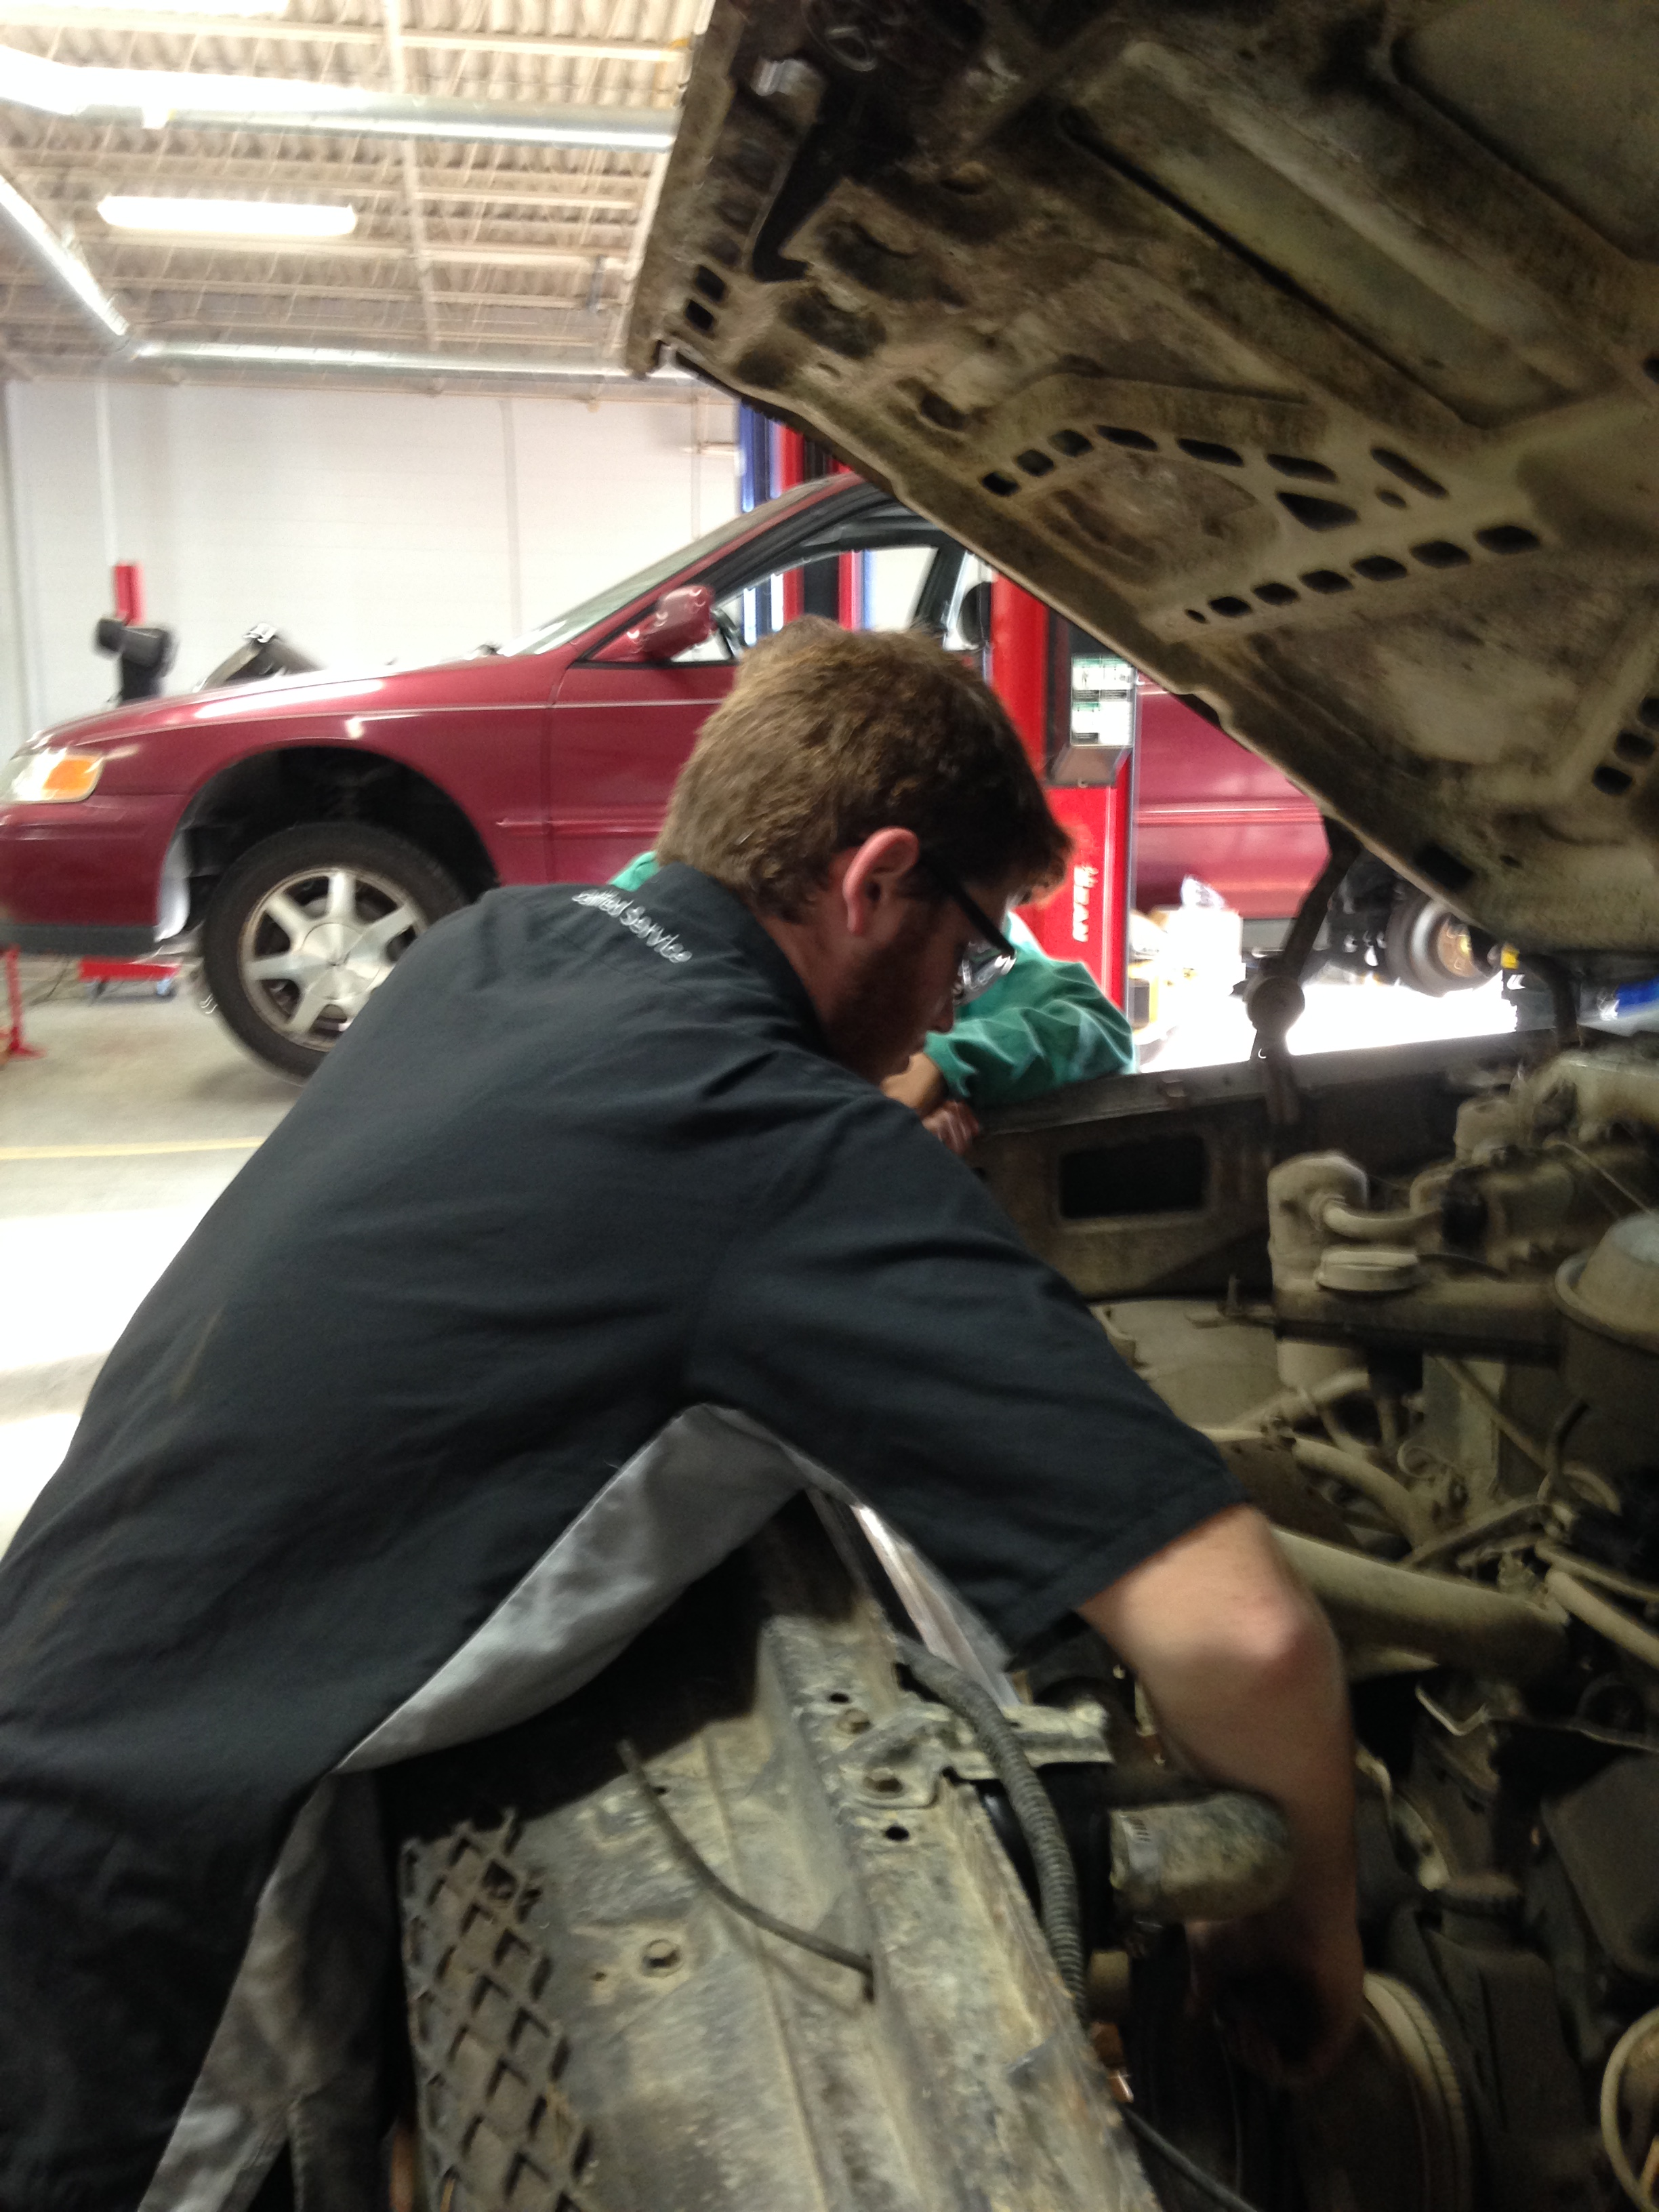 Auto Repair Insurance >> Mjm Insurance Of Chesterfield Missouri Auto Repair Shop Insurance